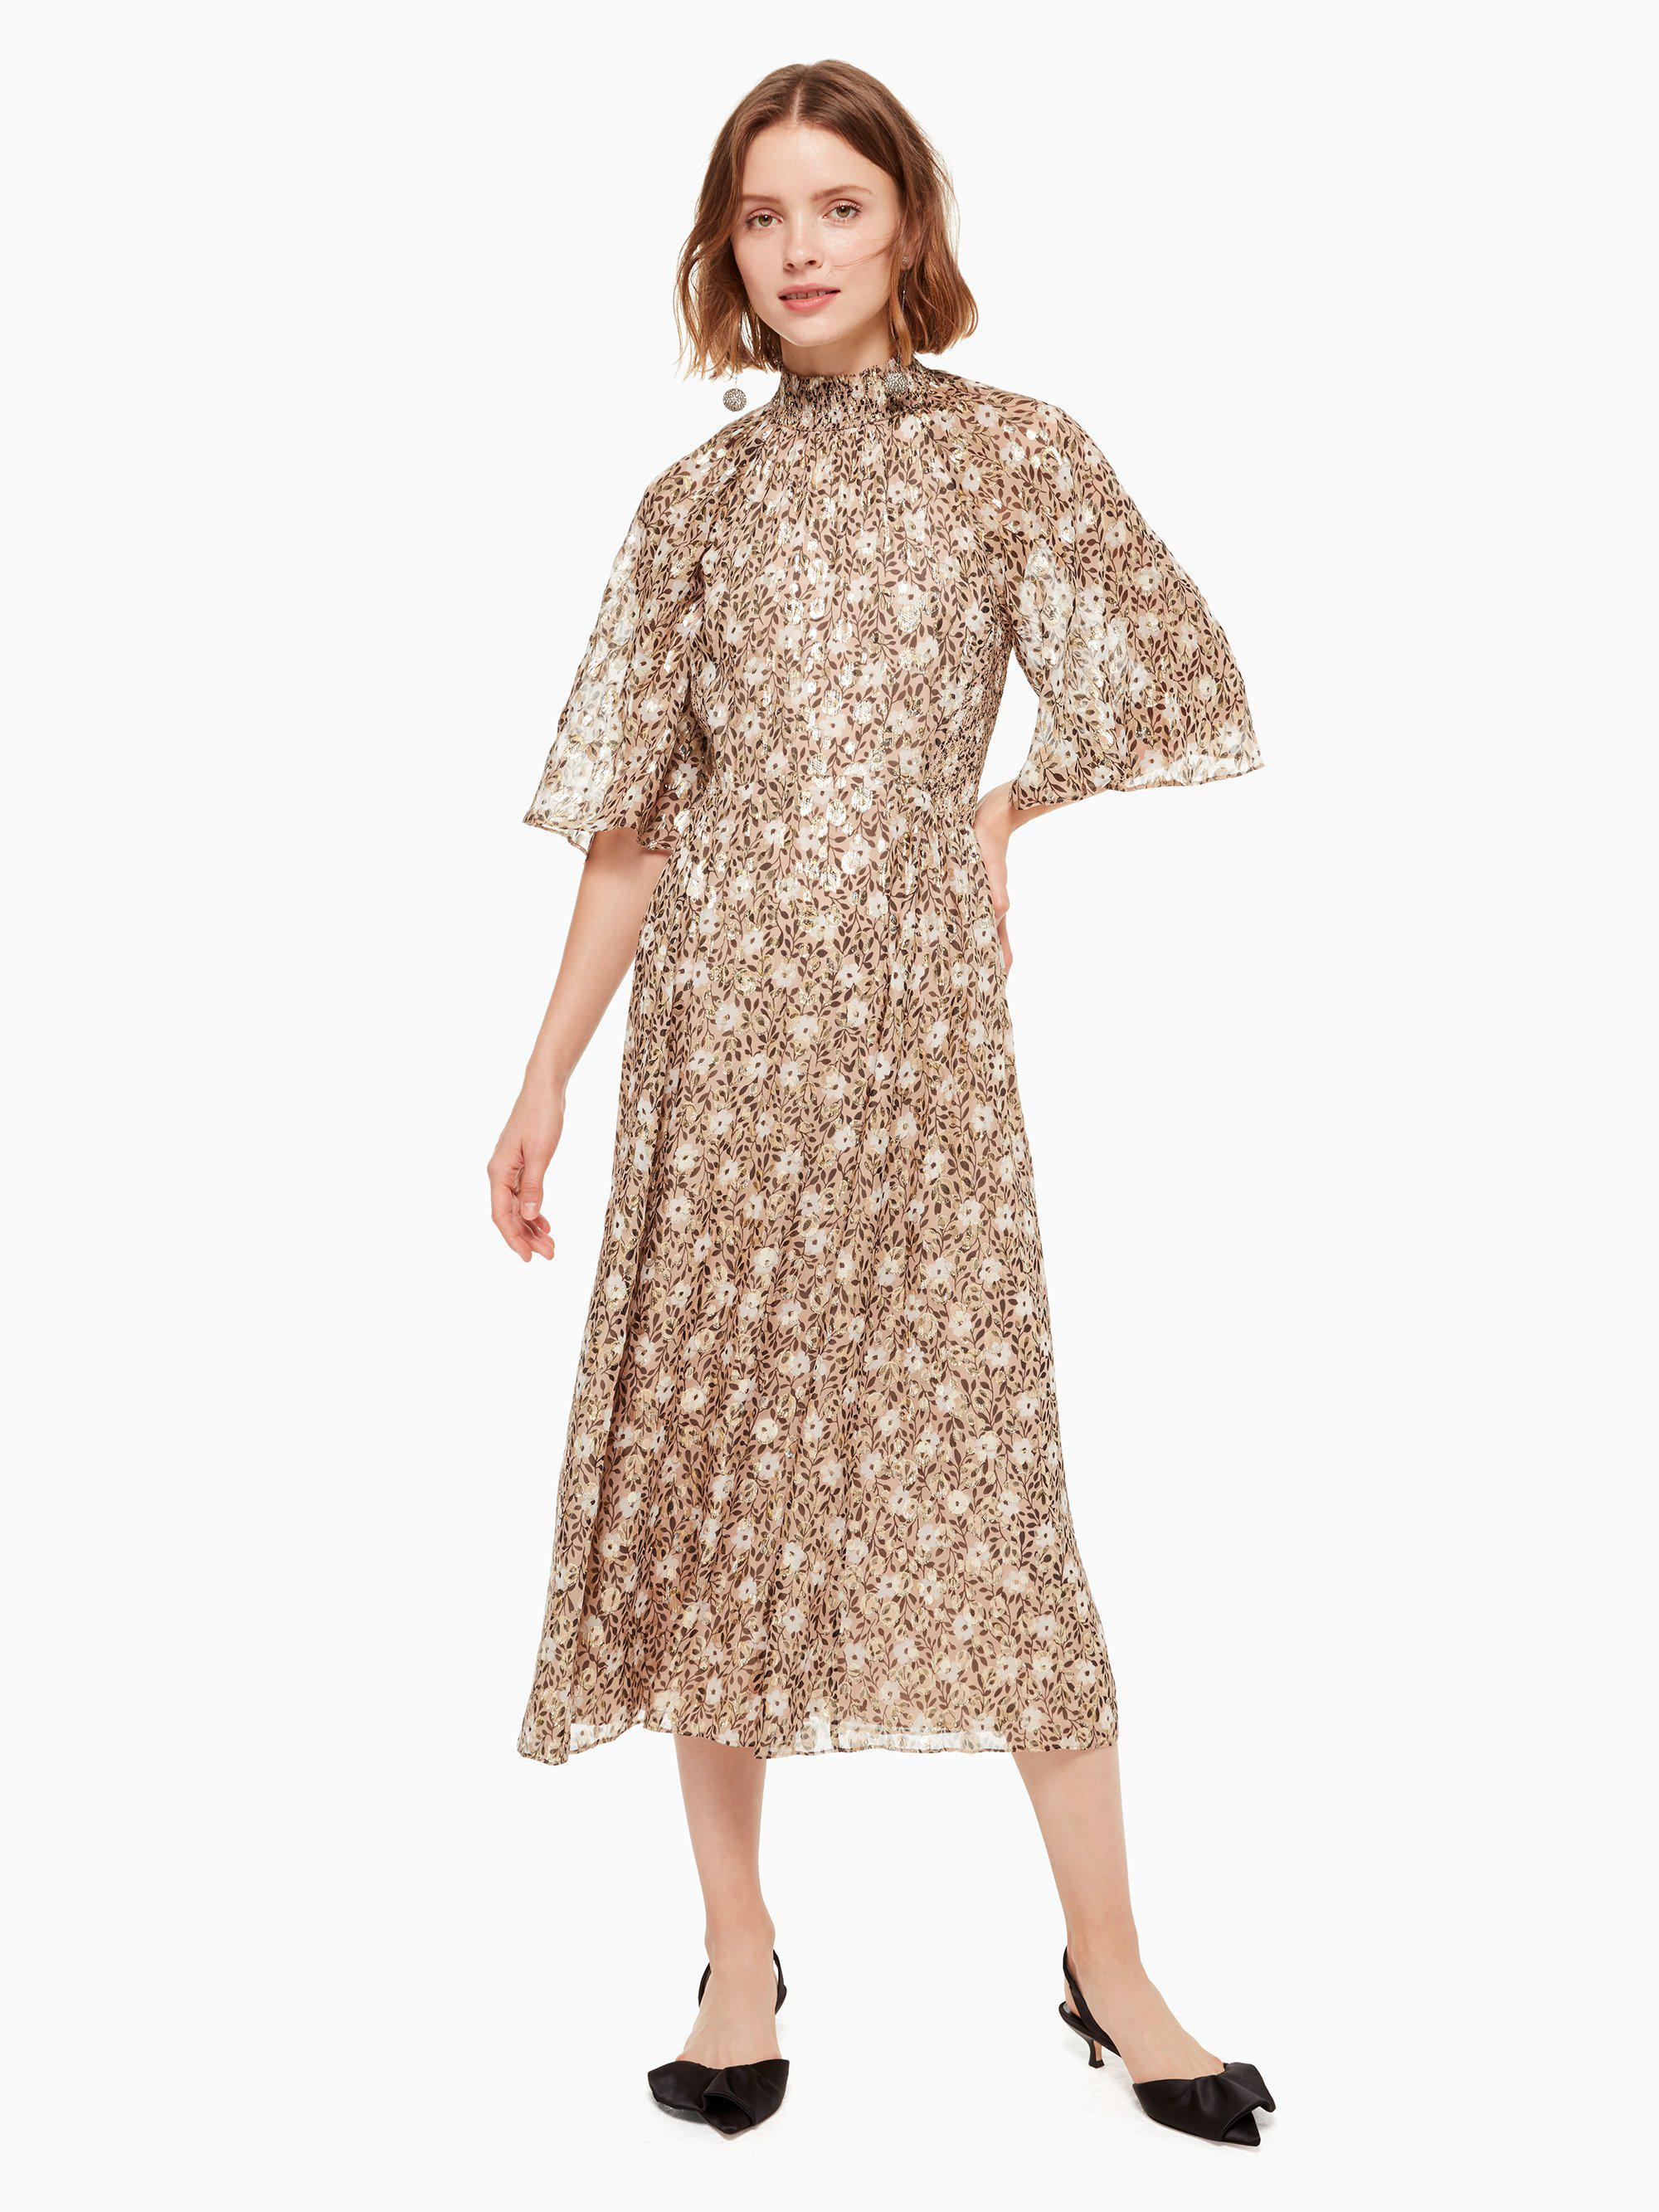 aabdf62d8a7d1 Lyst - Kate Spade Floral Park Clip Dot Midi Dress in Natural - Save 25%